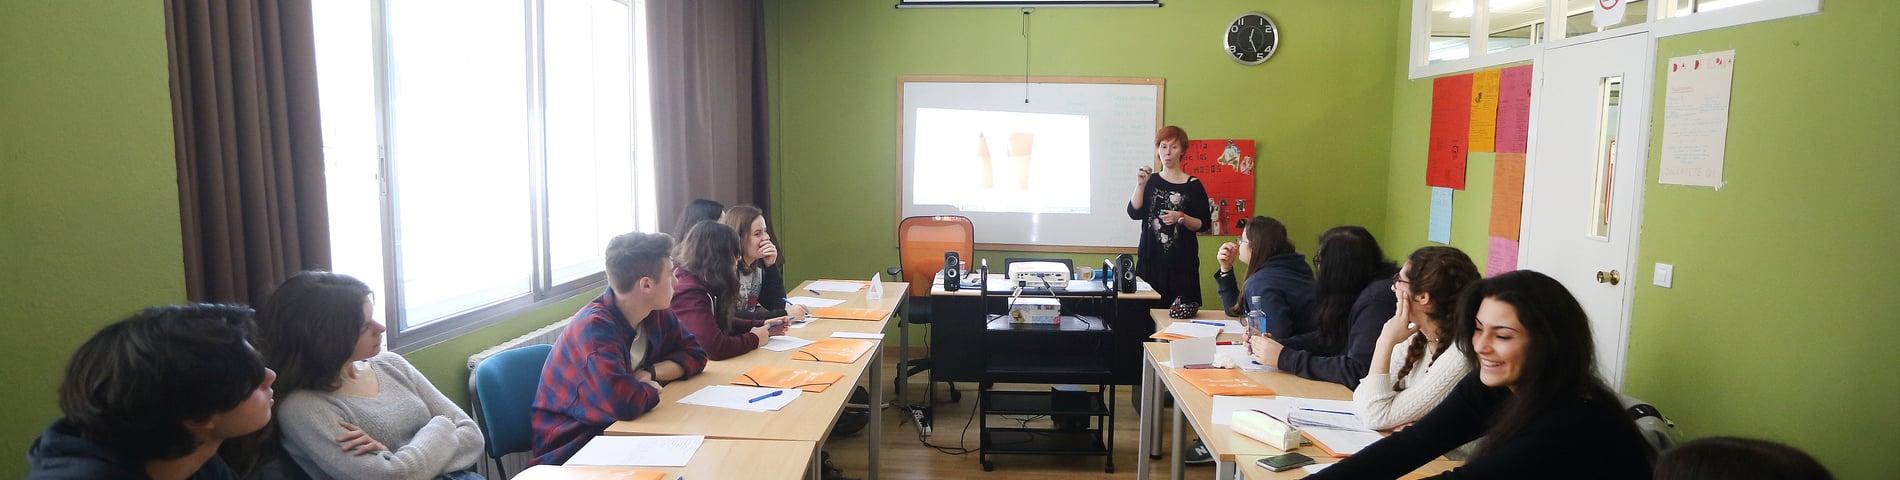 Academia Iria Flavia bild 1